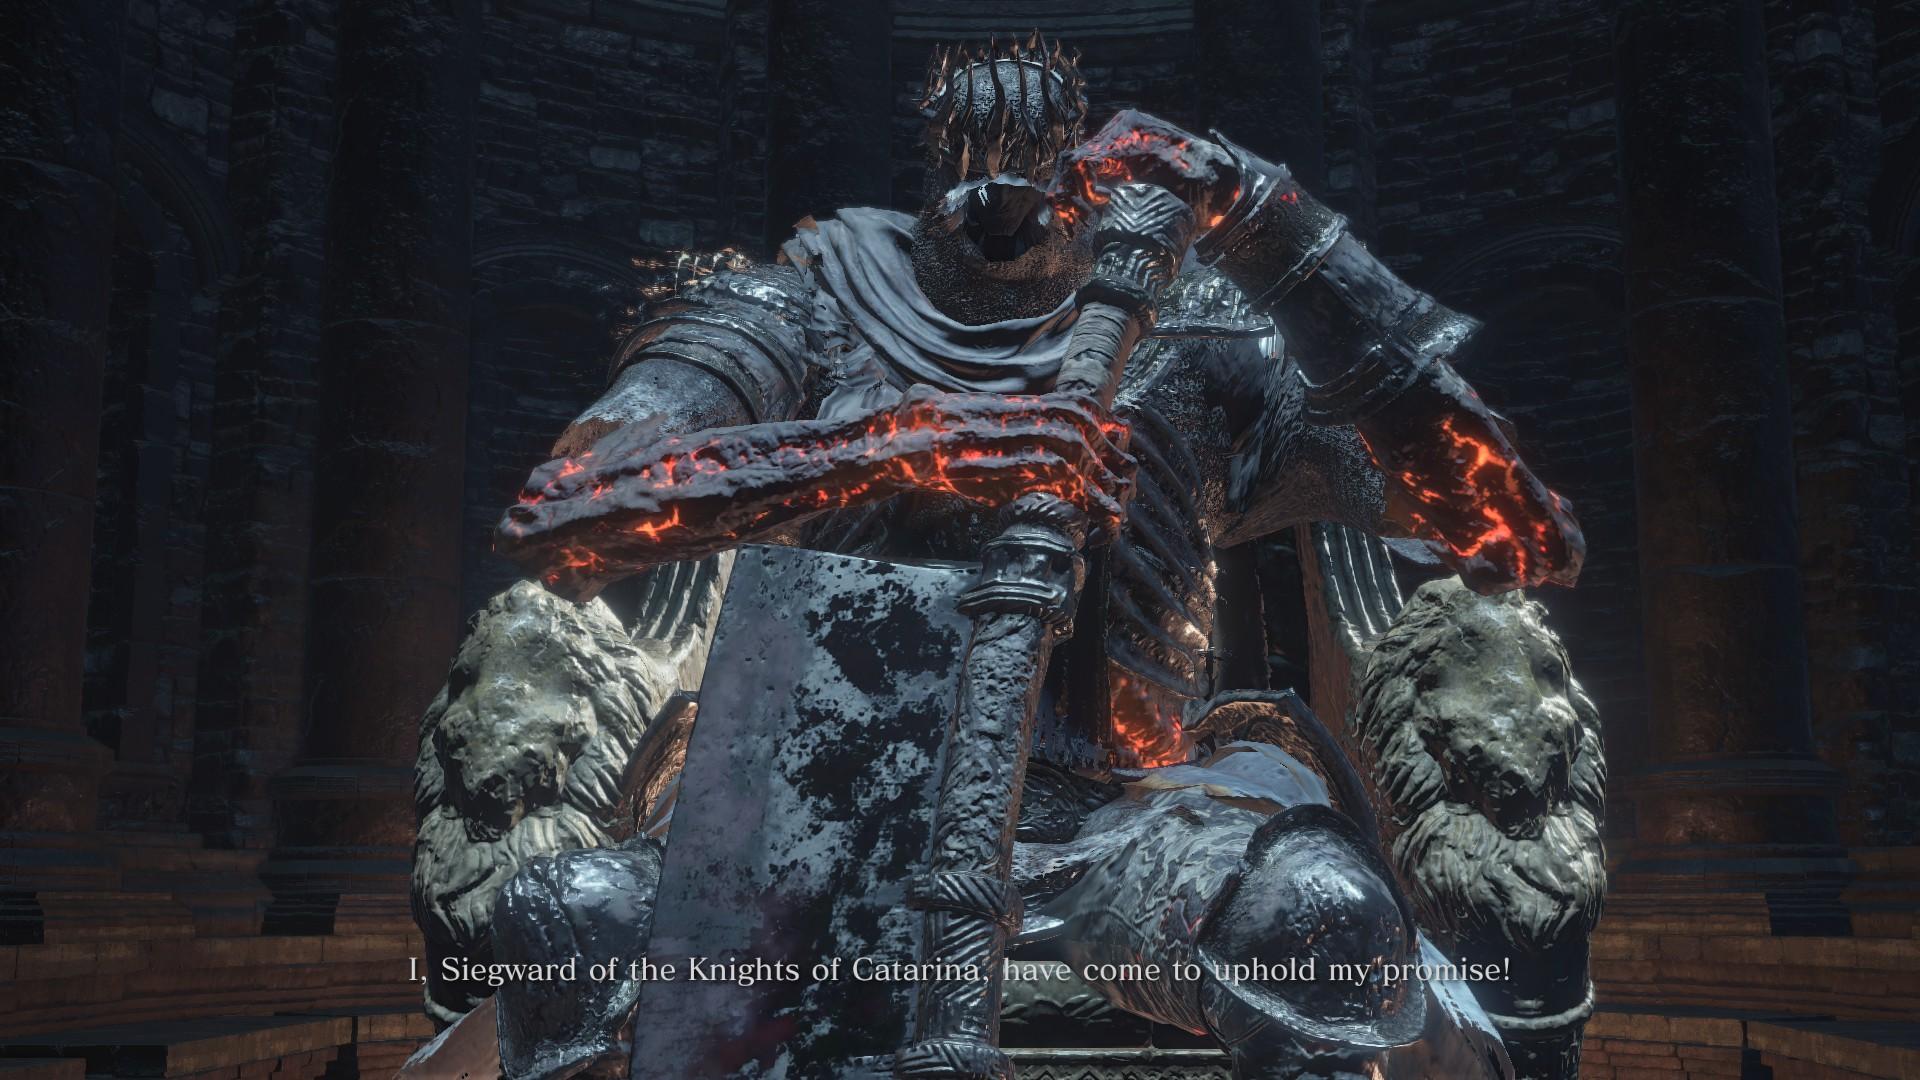 Dark Souls 3 Hardest To Least Difficult Boss Gaming Nigeria